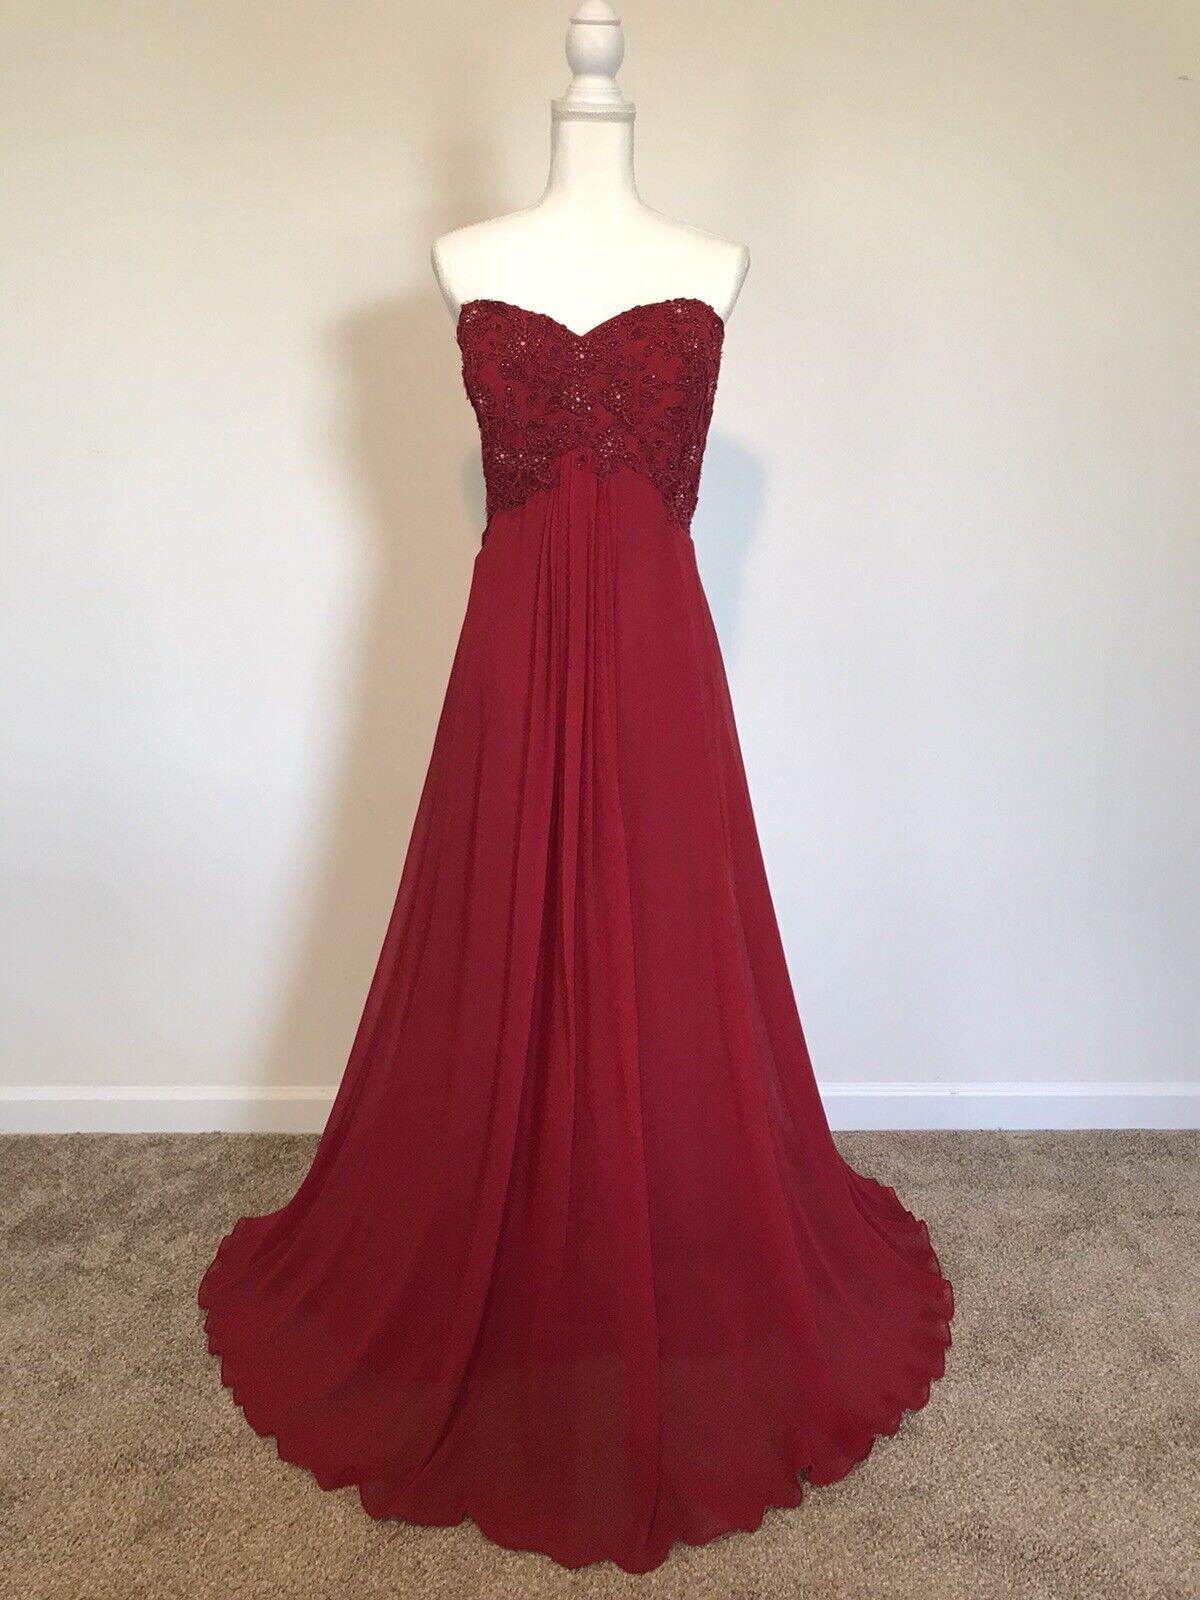 Montage Garnet Red Beaded Chiffon Gown w/Shawl Size 16 NWT